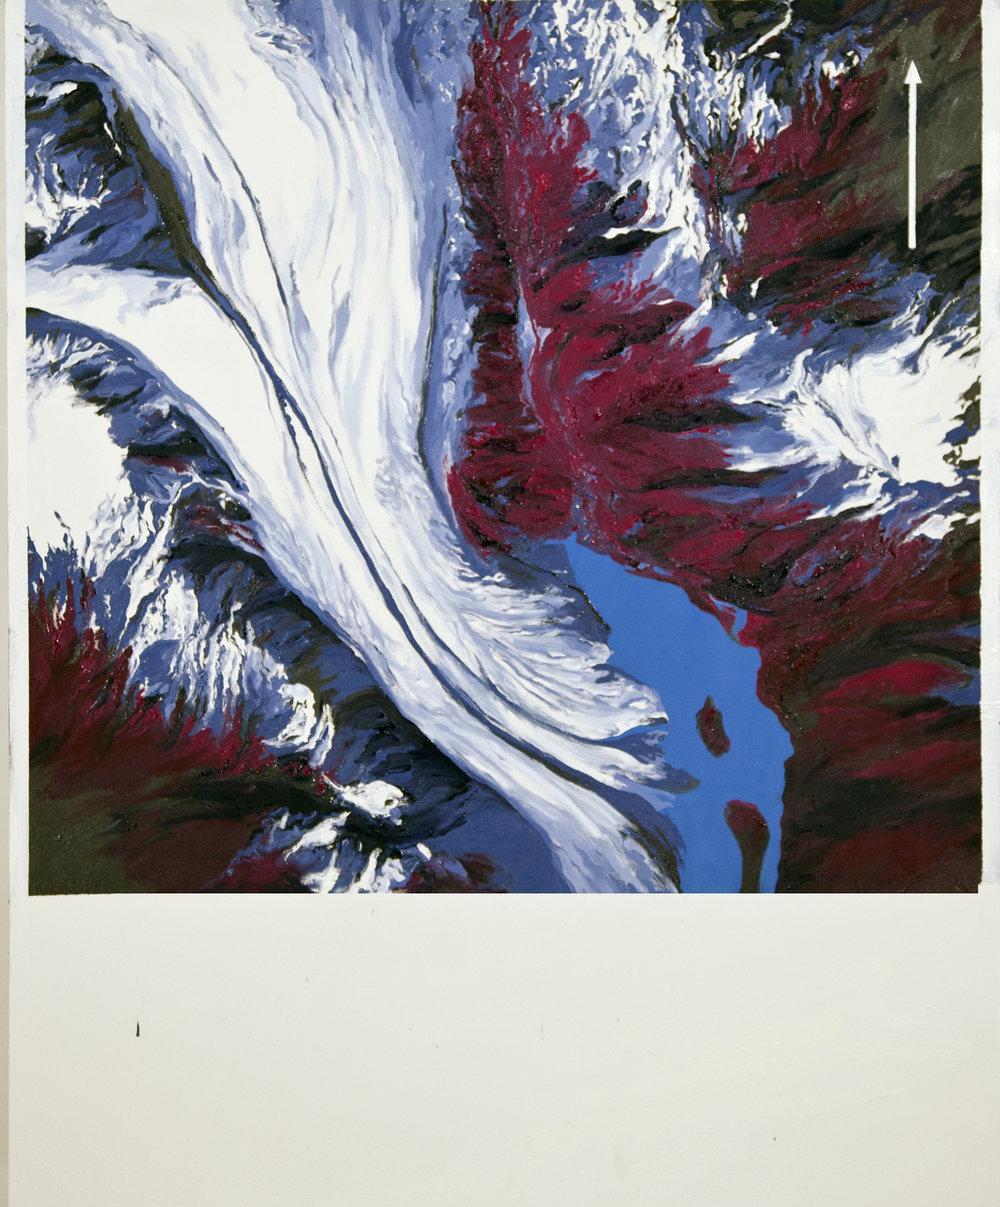 Bear Glacier 1984 AHAP Aerial USGS